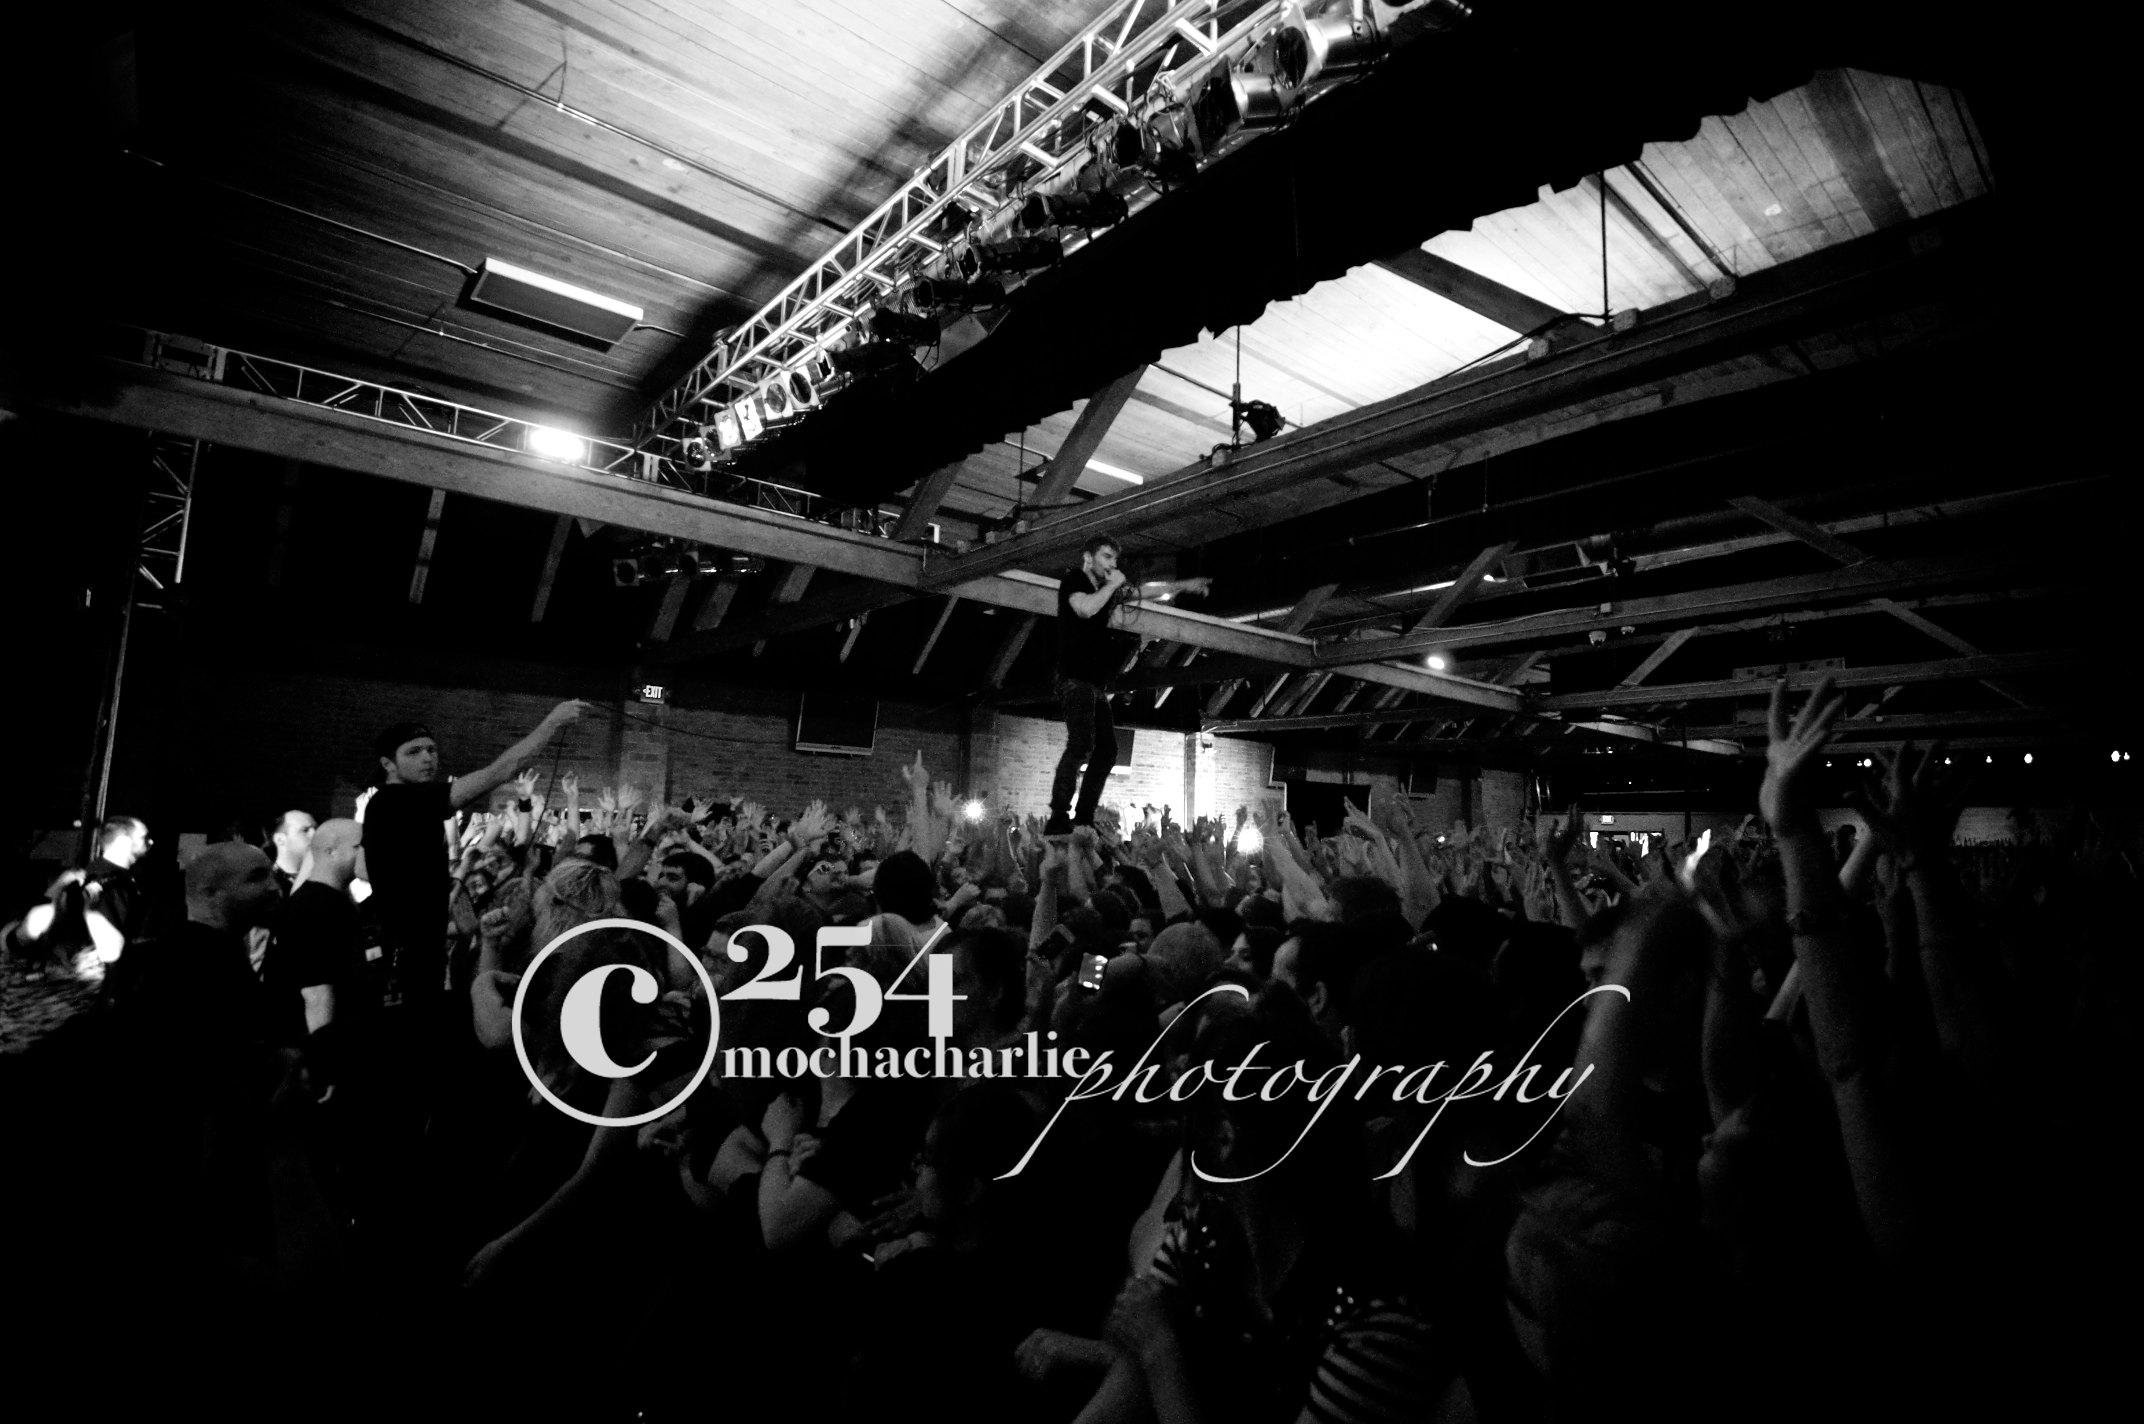 Fall Out Boy / New Politics Live @ Showbox SoDo – 6/19/13 (Photos by Mocha Charlie)